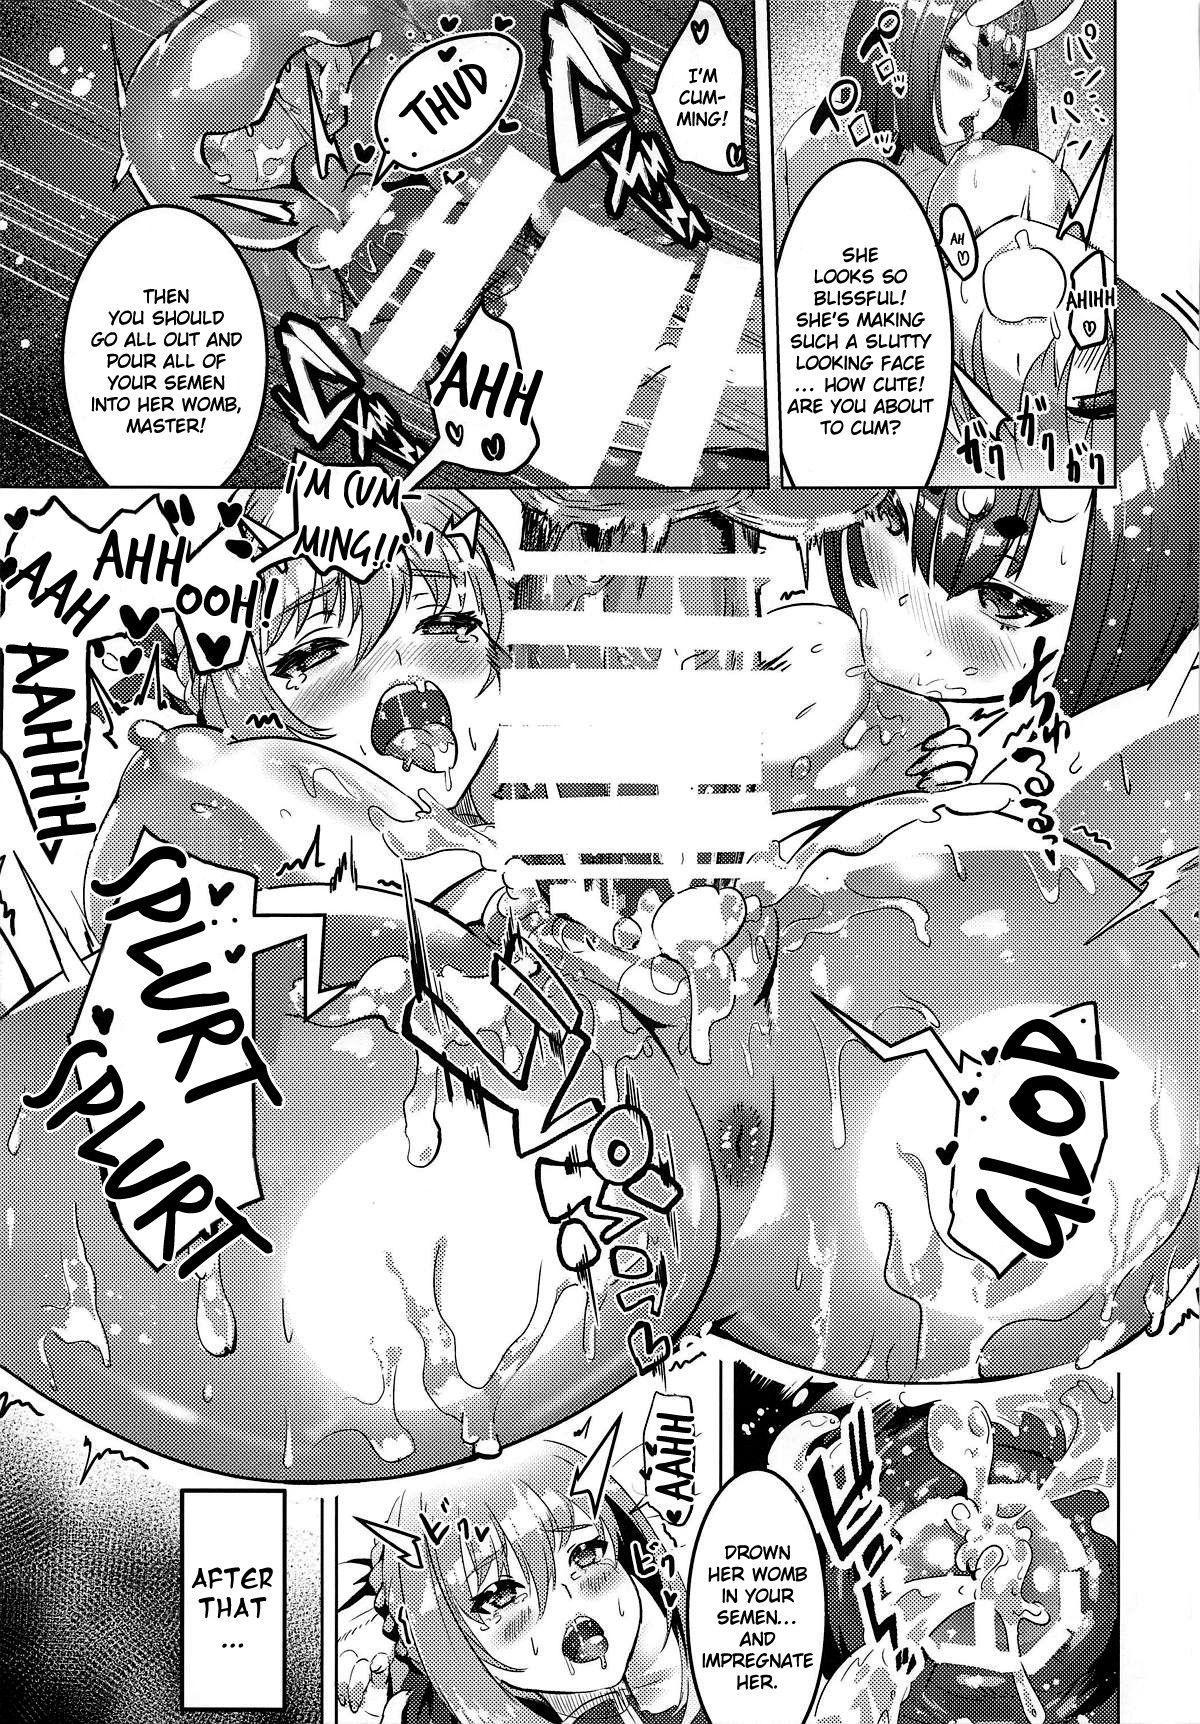 Koutei to Oni no Erohon   An Ero Book About an Emperor and an Oni 13